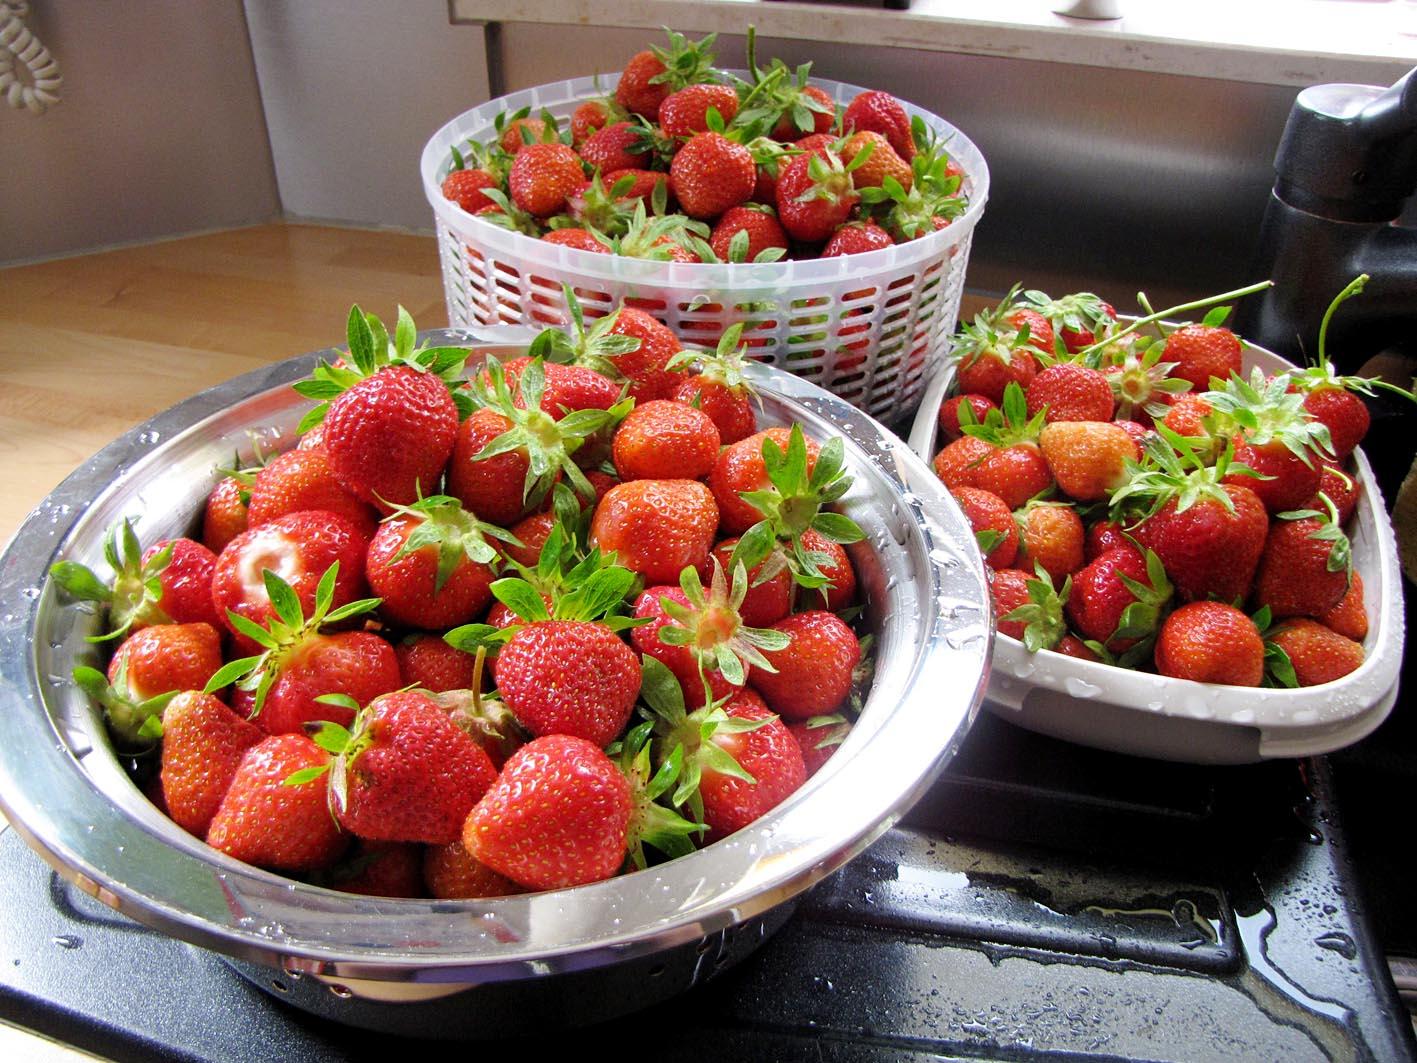 erdbeeren im topf erdbeeren im topf so gedeihen sie am. Black Bedroom Furniture Sets. Home Design Ideas